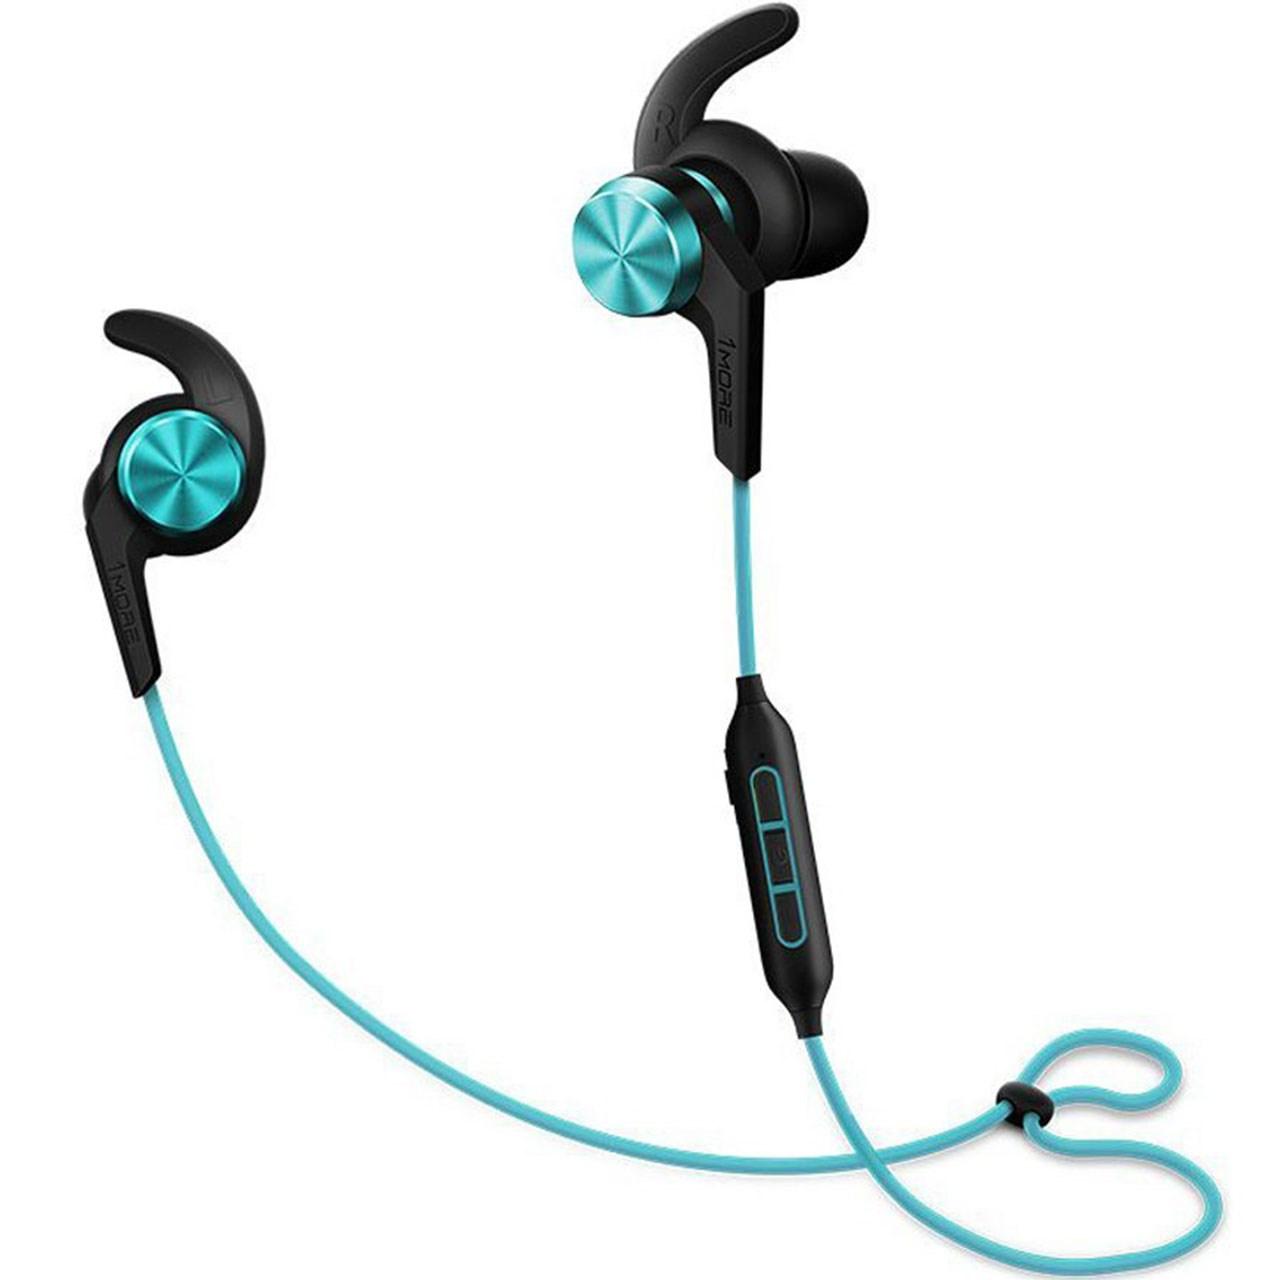 هدفون وان مور مدل iBFree | 1More iBFree Headphones